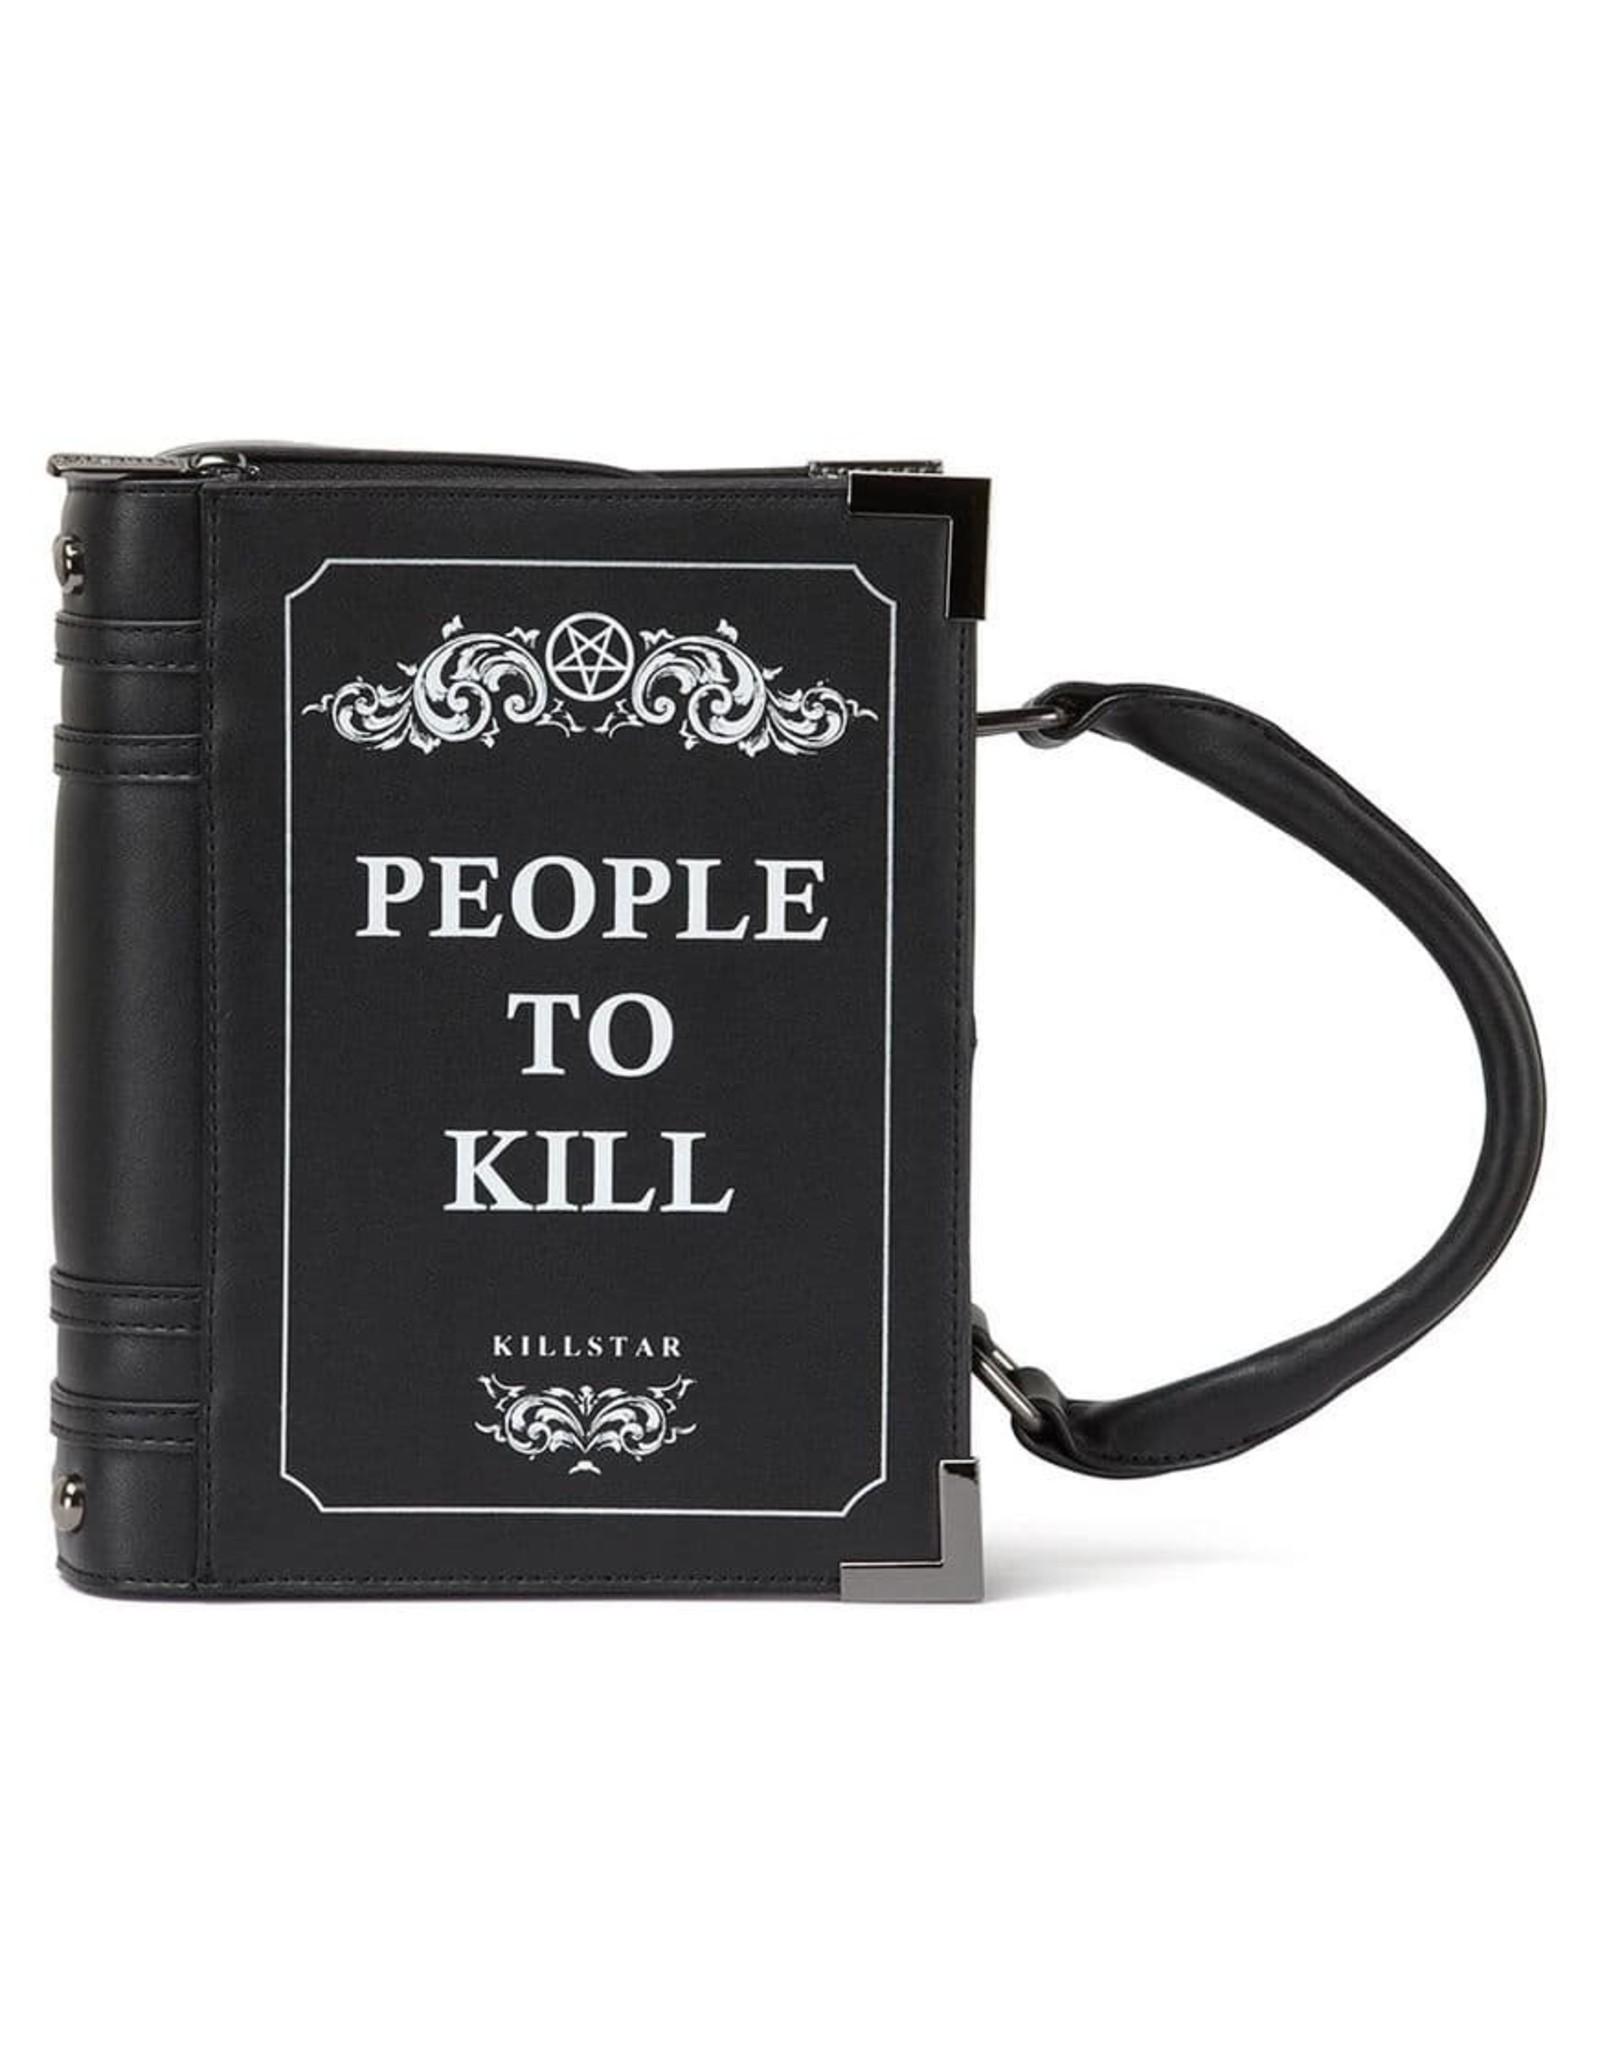 Killstar Gothic bags Steampunk bags - Killstar Kill List Book handbag